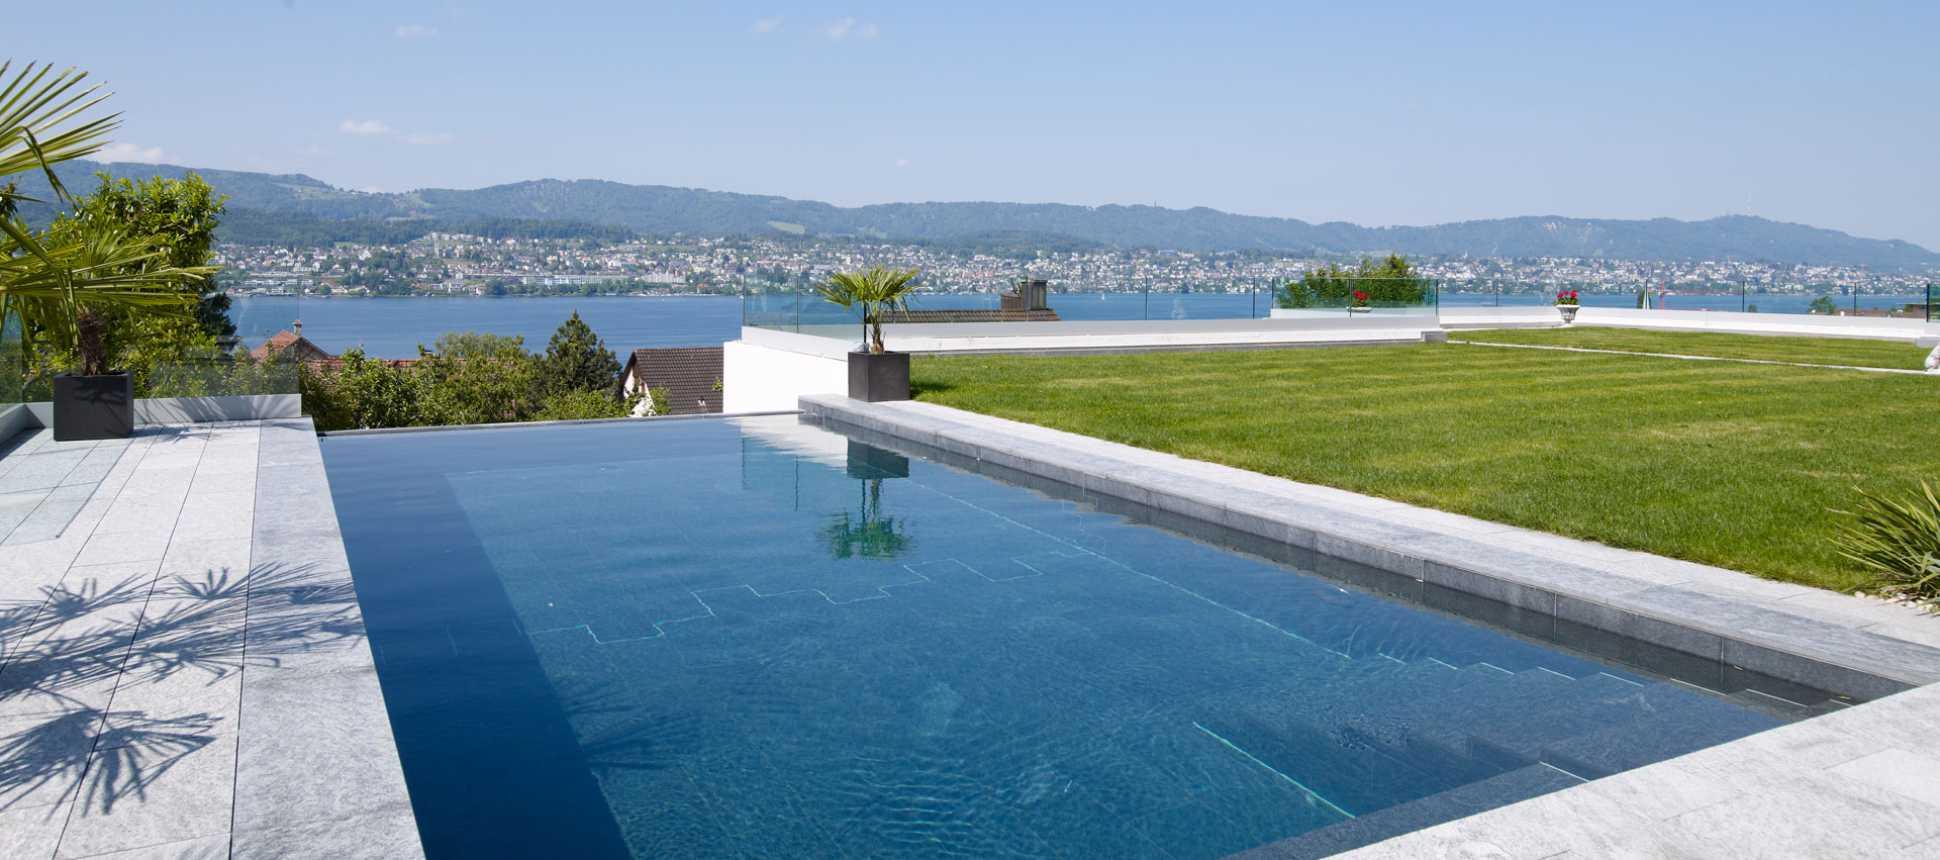 Swimmingpool Mit Überlaufrinne